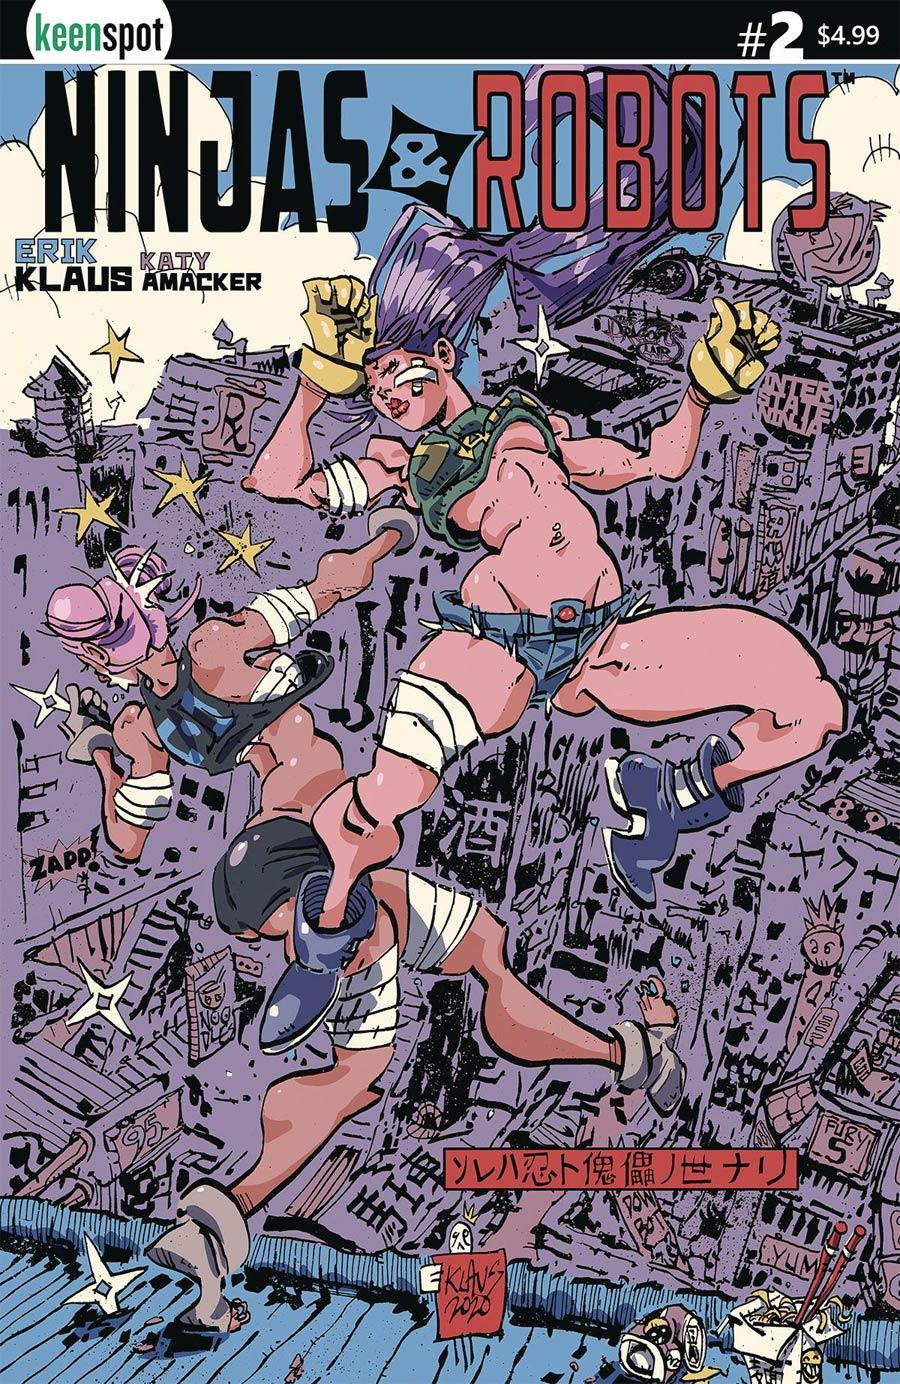 Ninjas And Robots #2 Cover A Regular Erik Klaus Cover